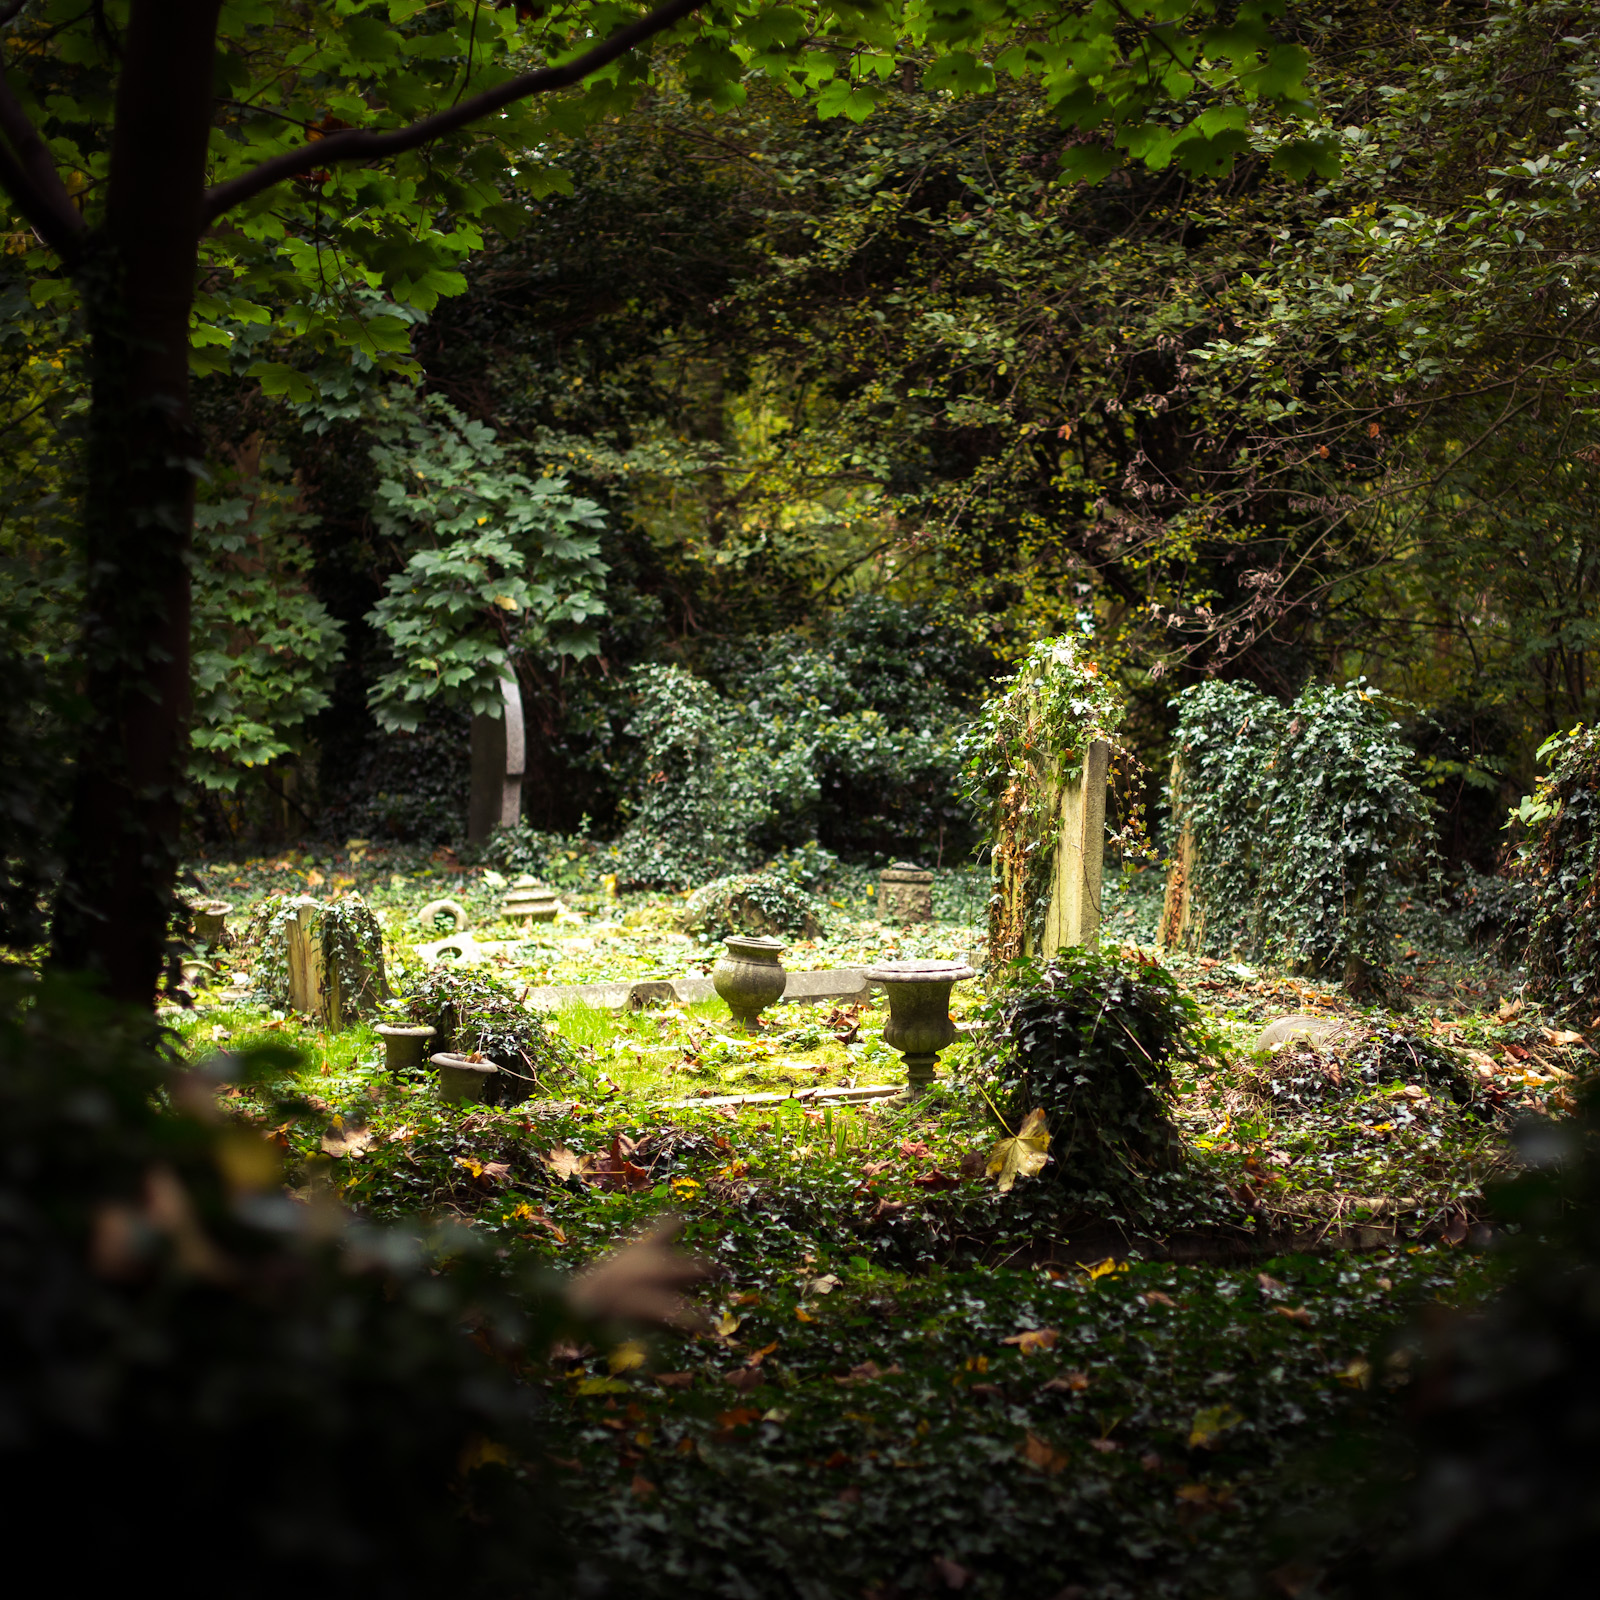 highgate cemetery  u2013 ben and viv u0026 39 s travels